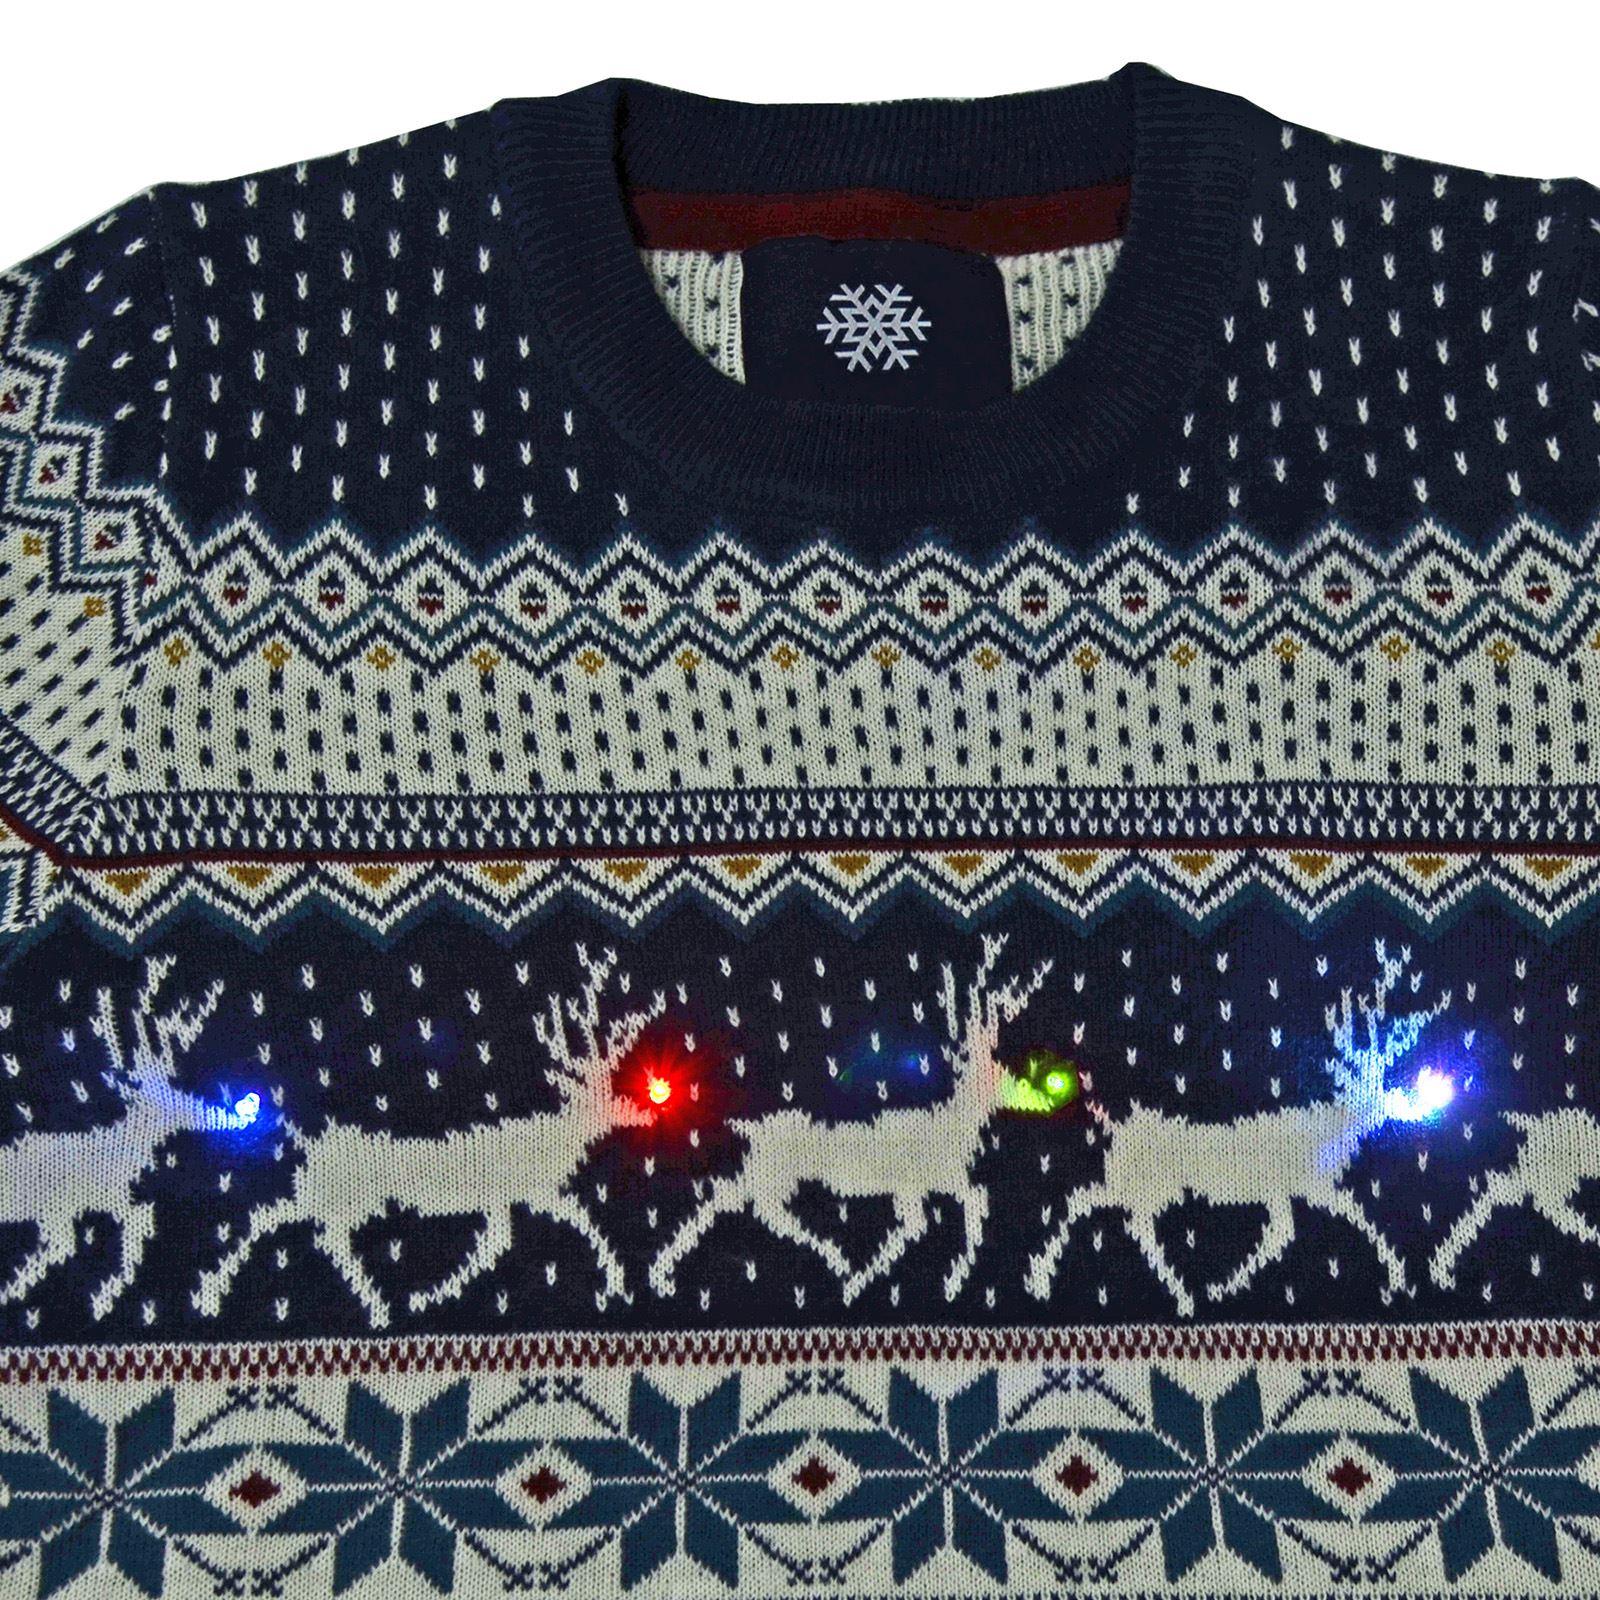 Mens Fair Isle Christmas Jumper Flashing Led Lights